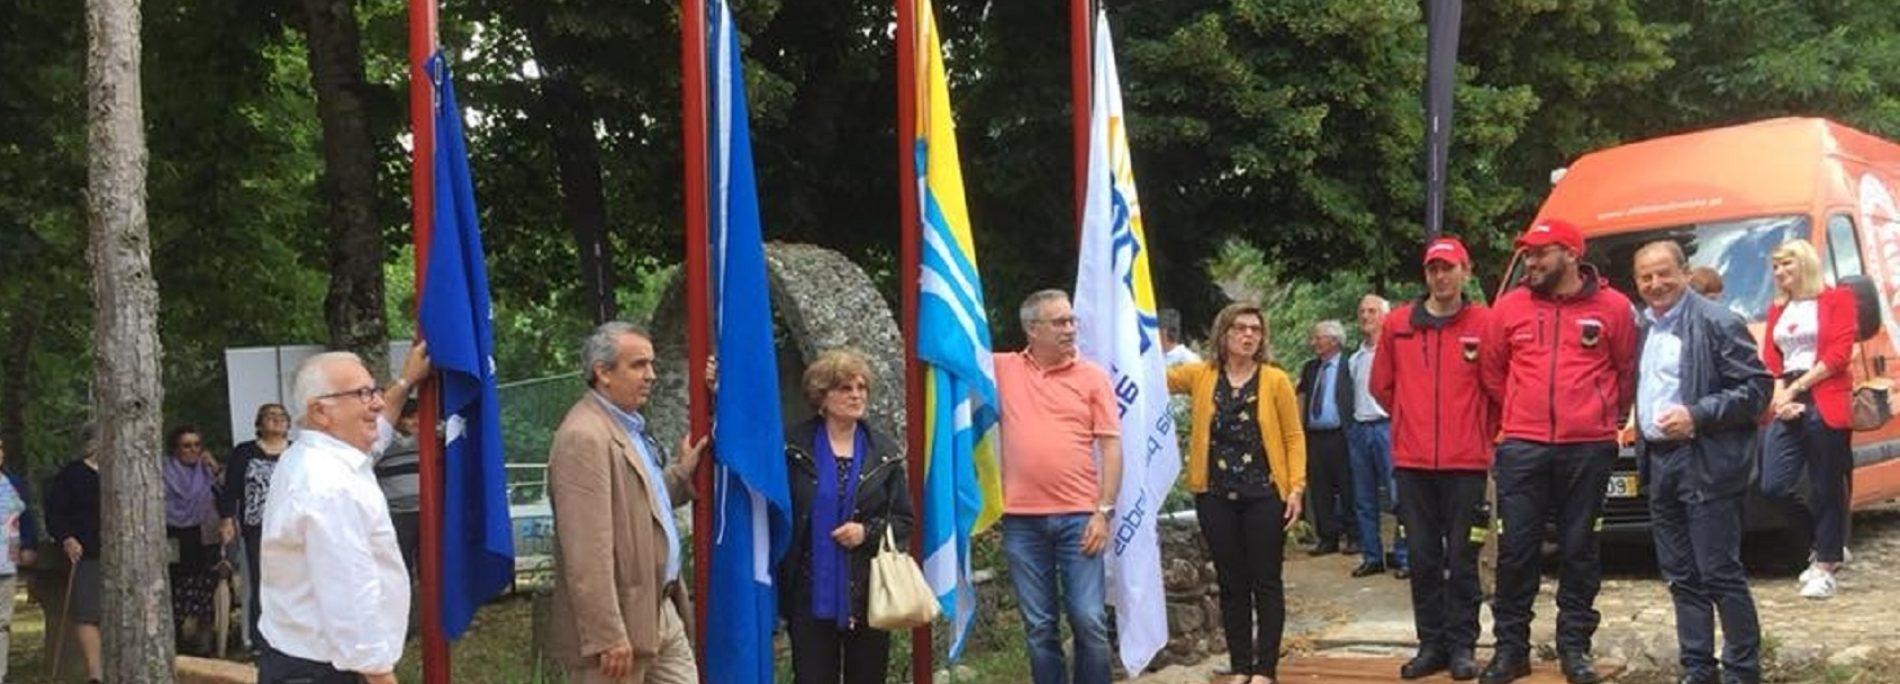 Alvoco das Várzeas volta a hastear Bandeira Azul, Qualidade de Ouro e Praia Acessível